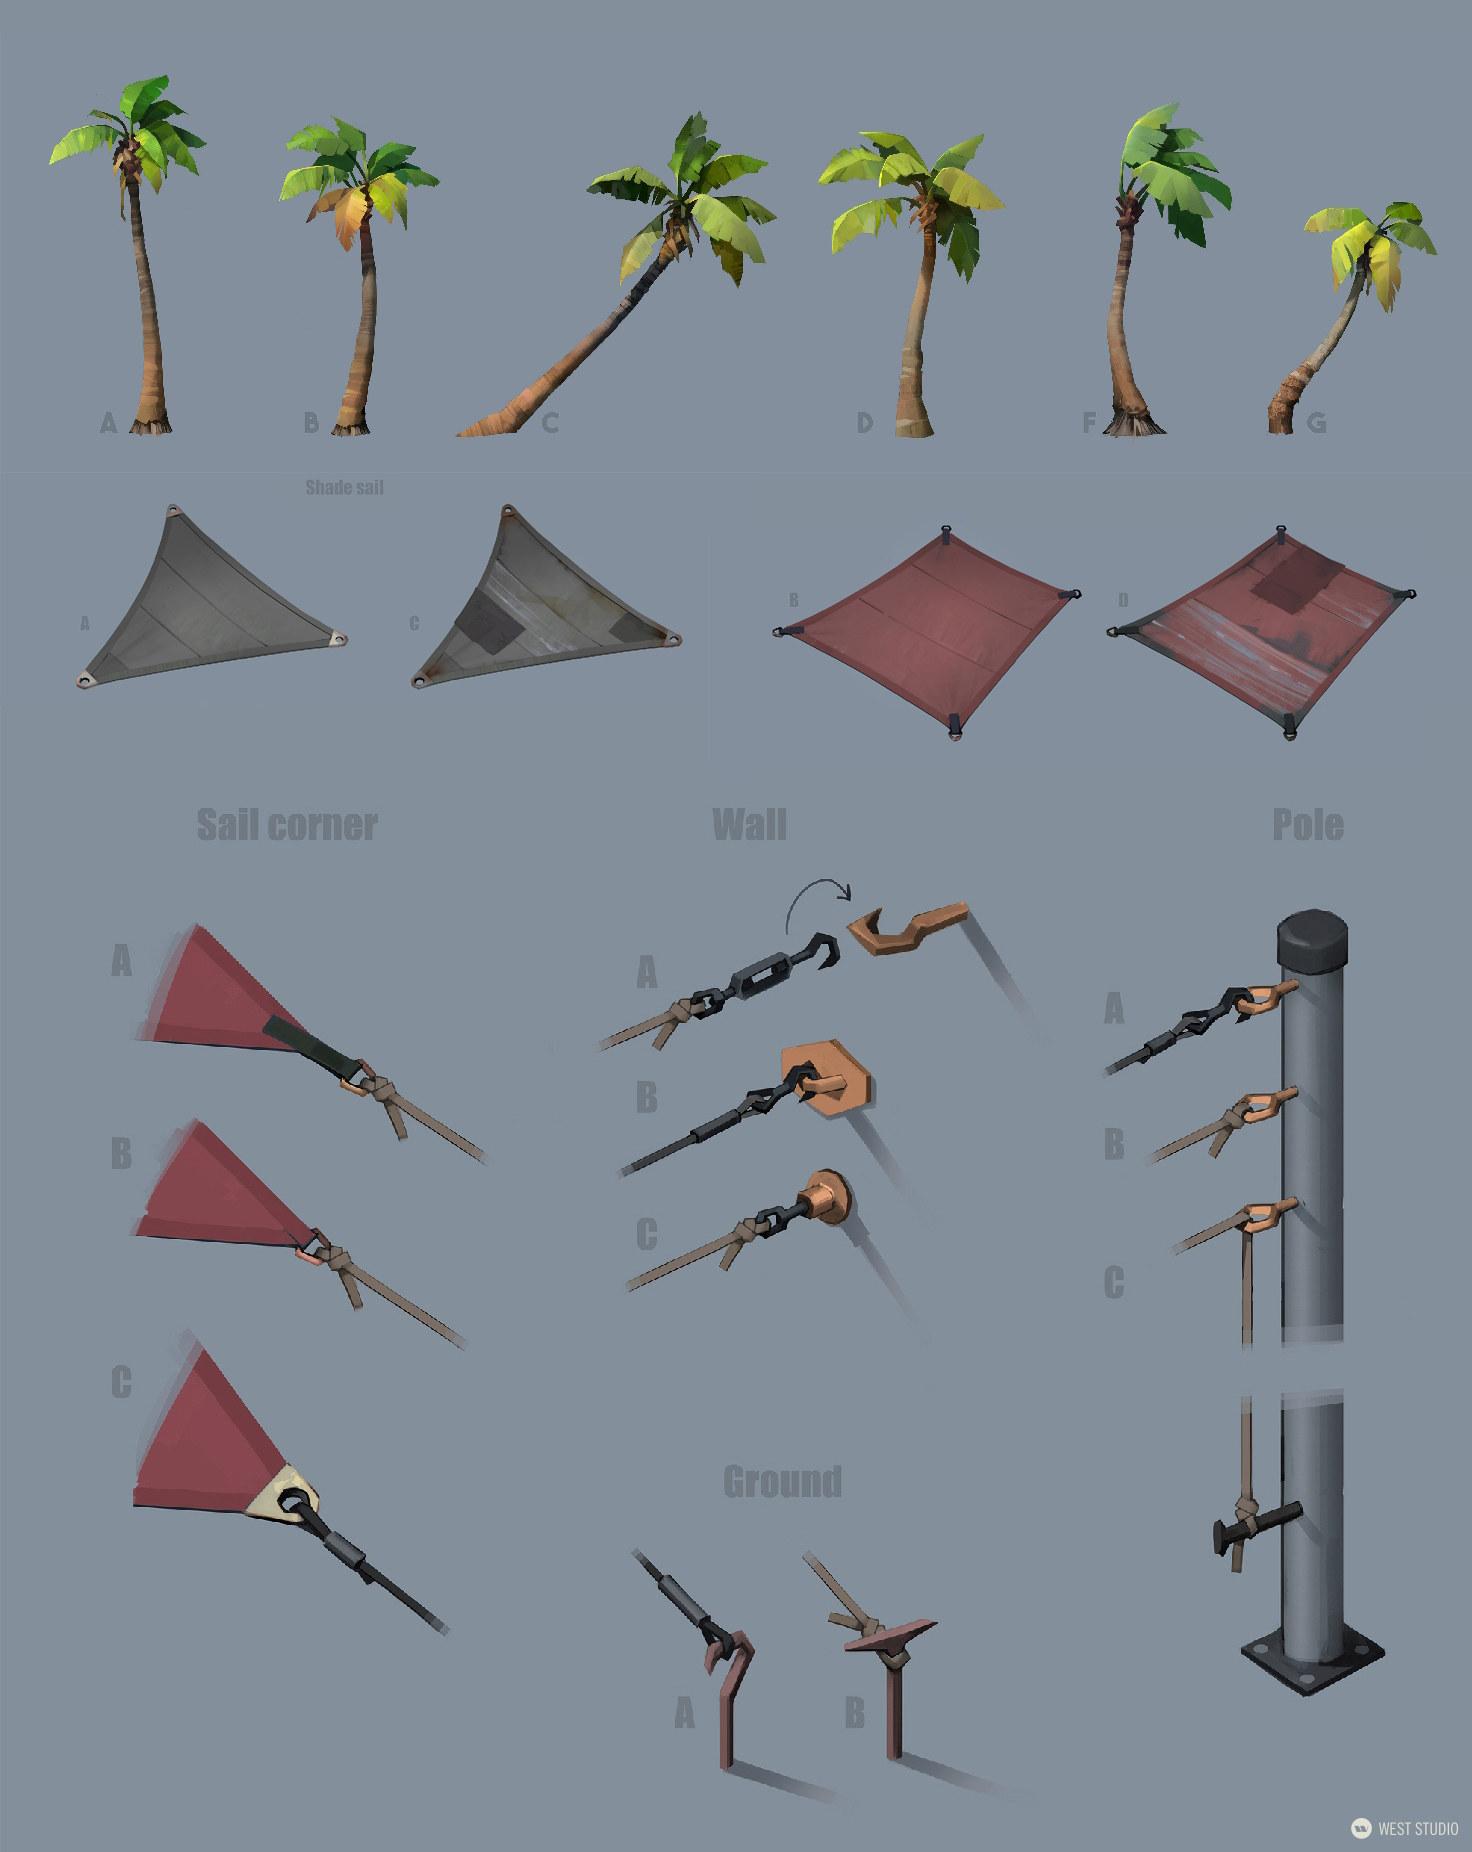 Riot Games, Riot, Valorant, Illustration, Game Development, In Game Art, West Studio, Digital Art, Map Development, Props